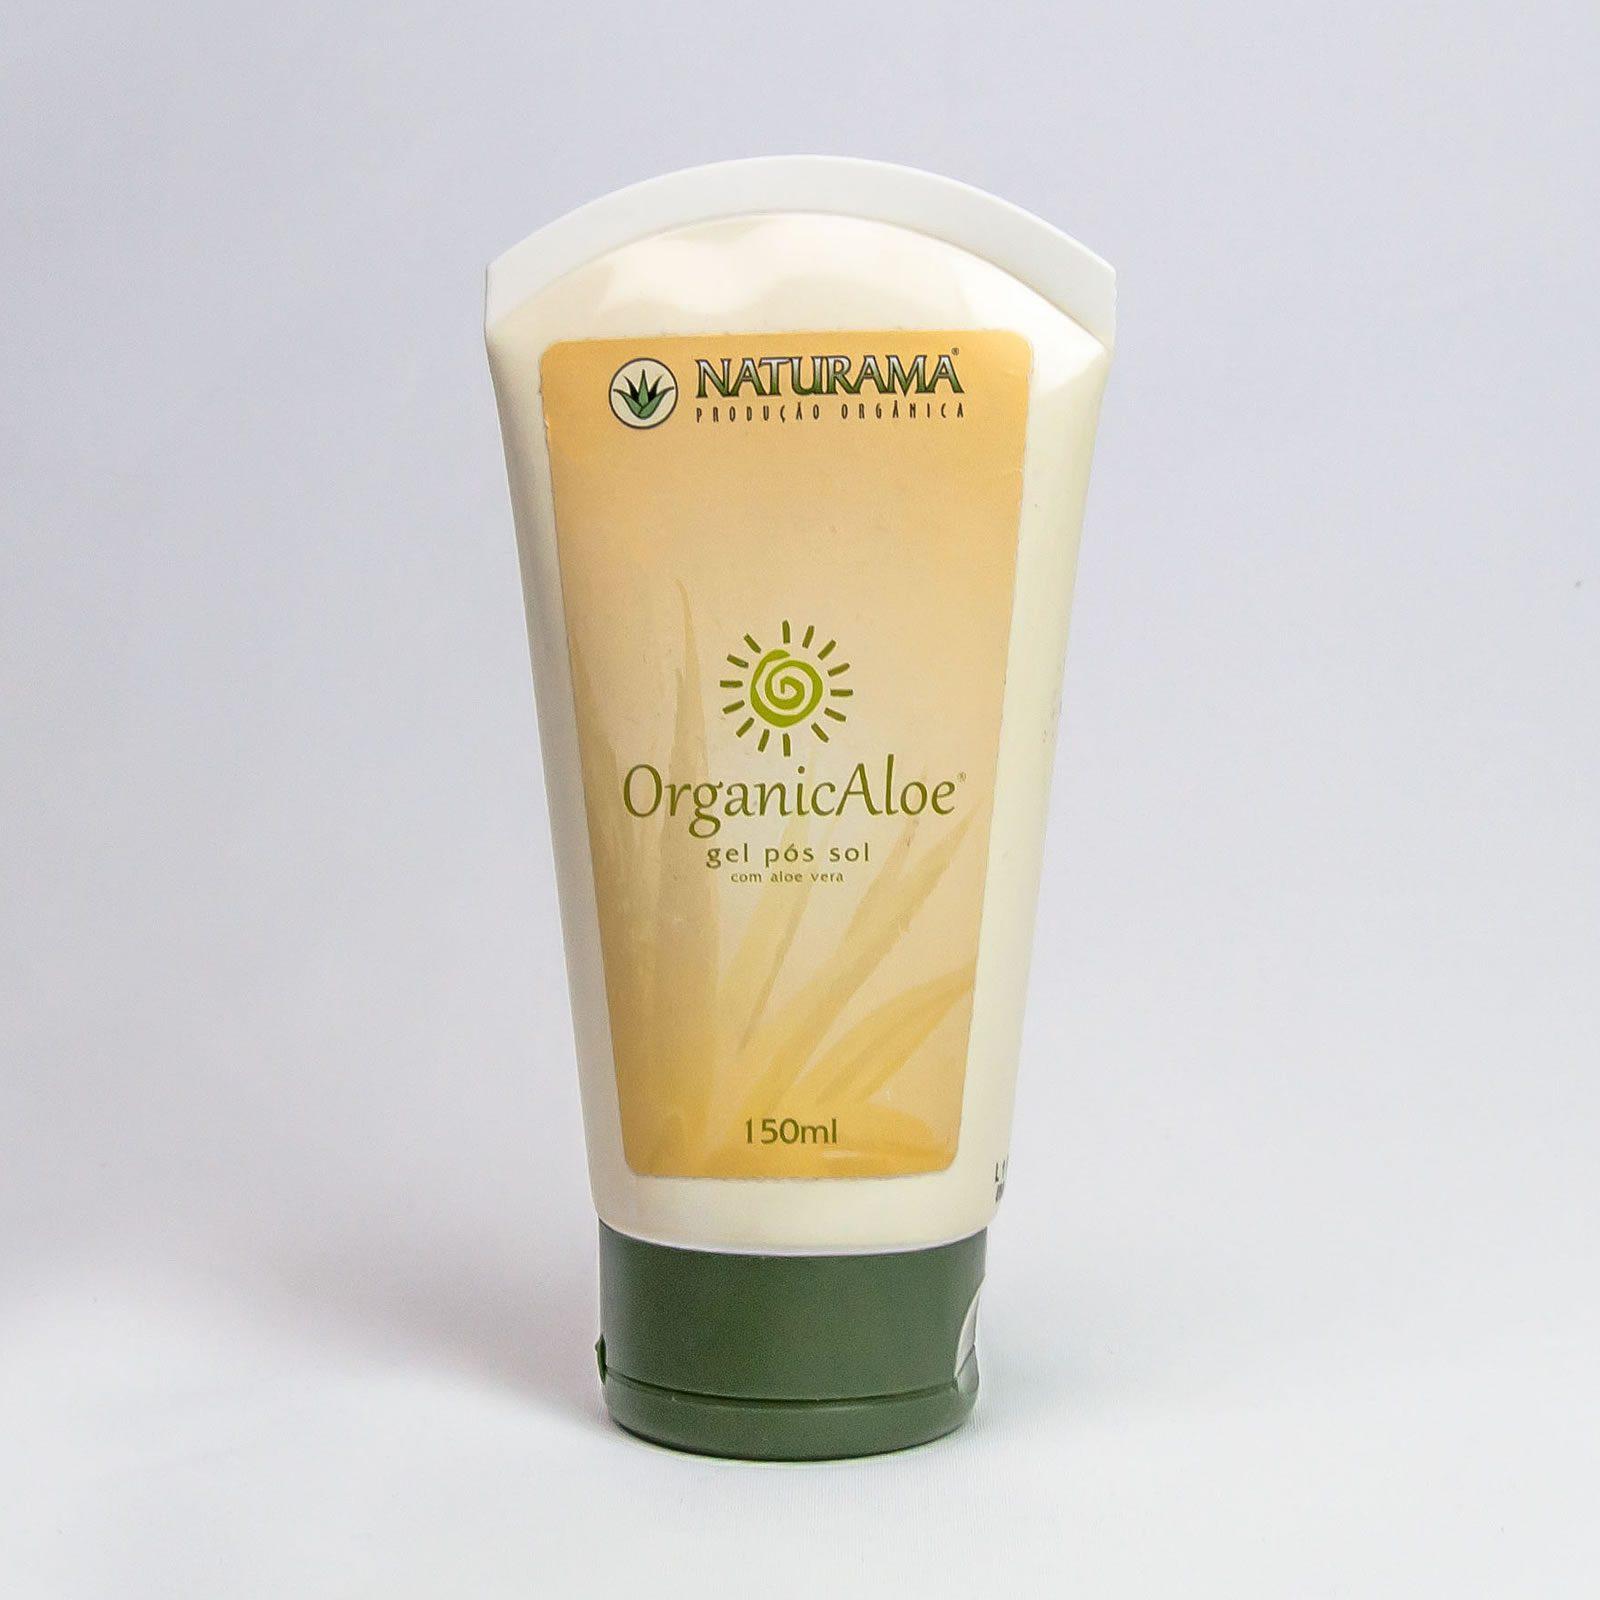 Gel Pós-Sol - OrganicAloe - Cosméticos Naturama